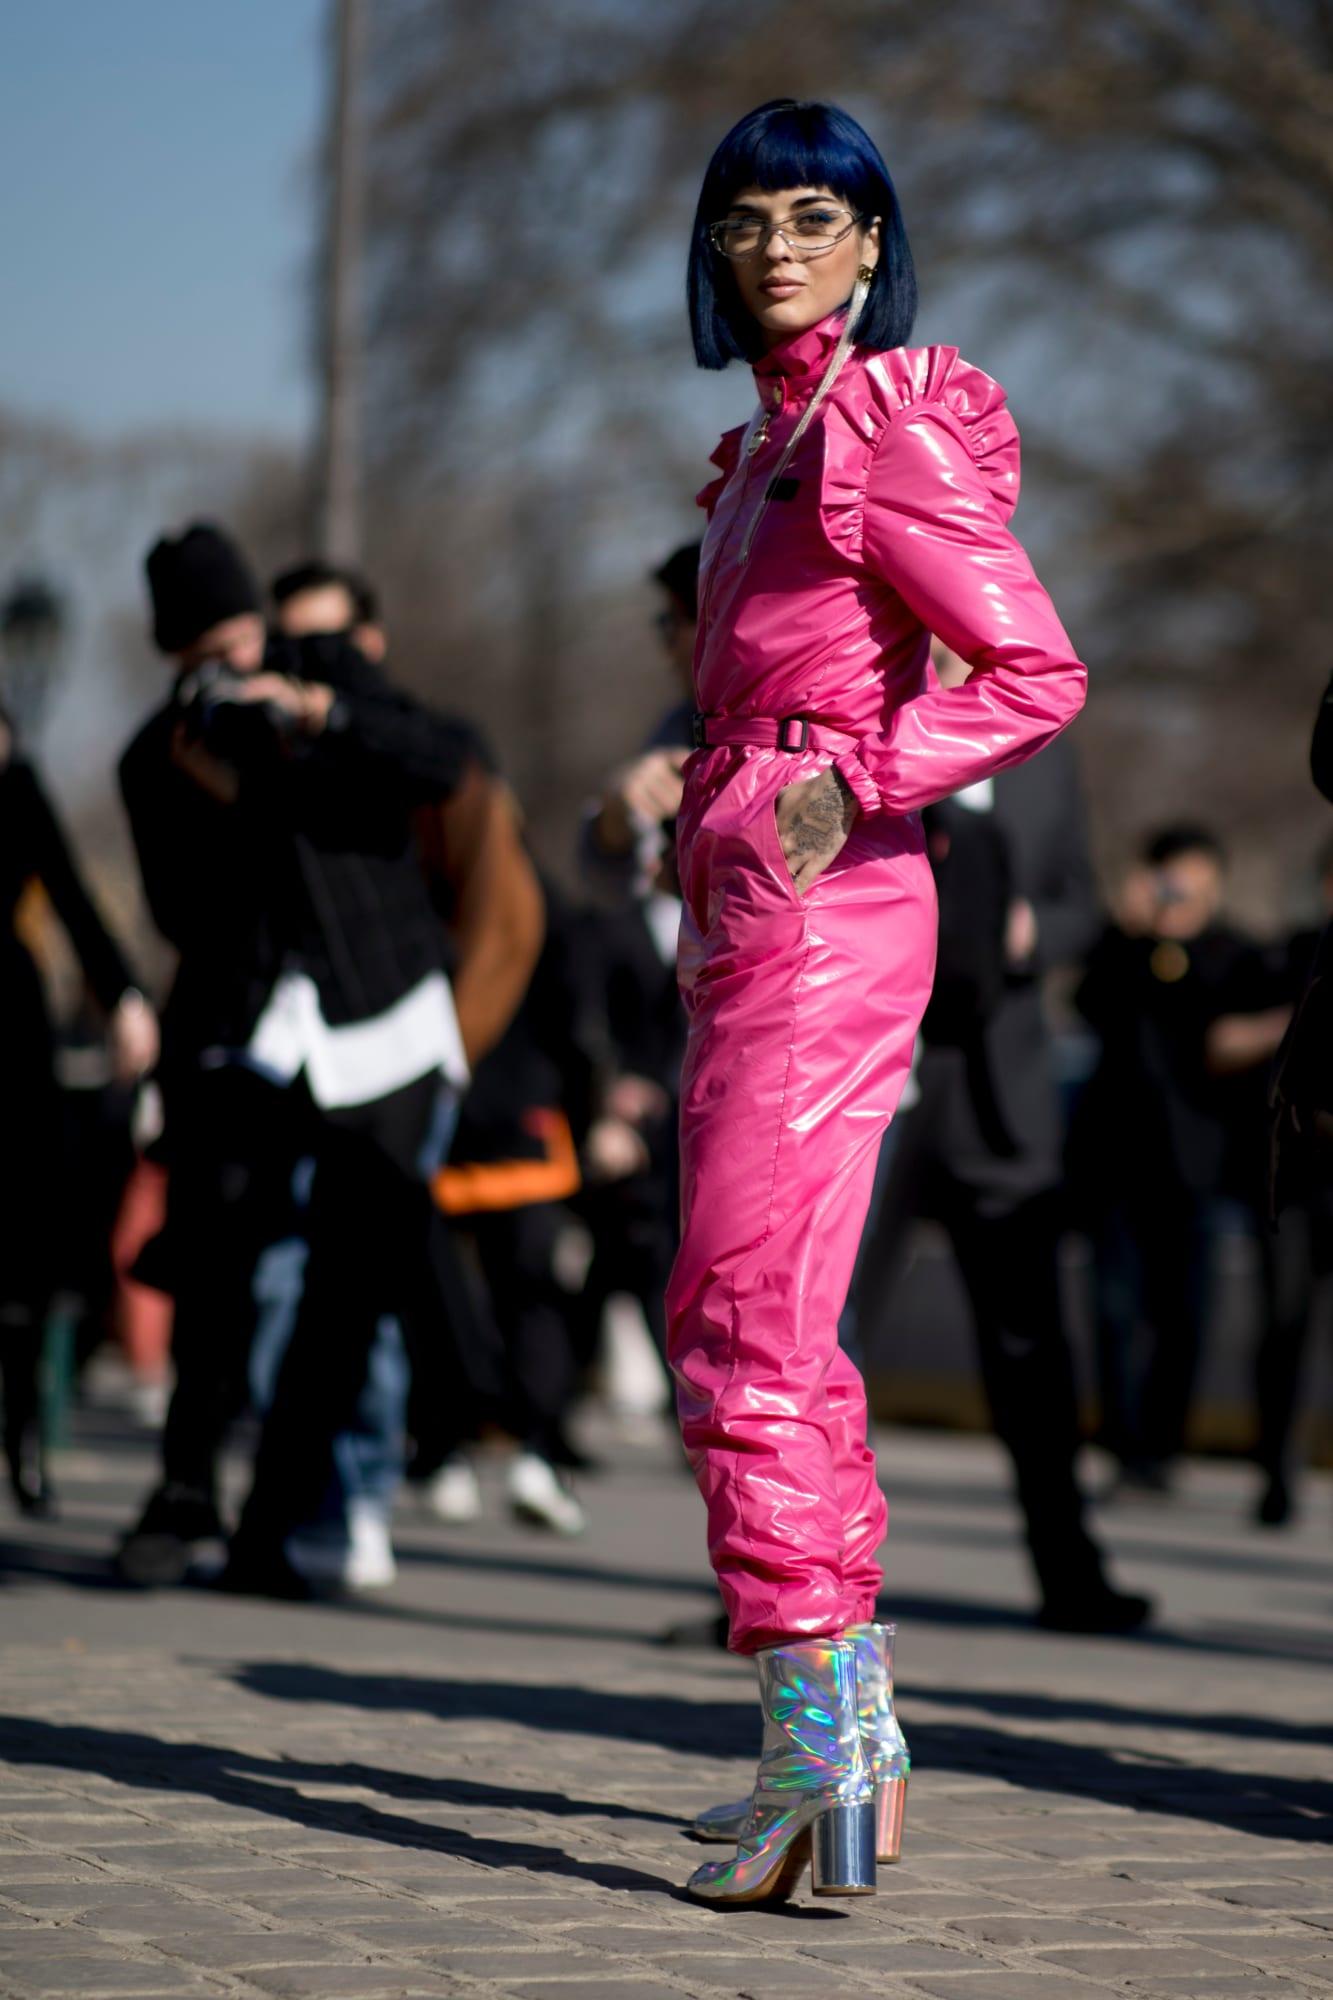 paris-fashion-week-fall-2019-street-style-day-2-38